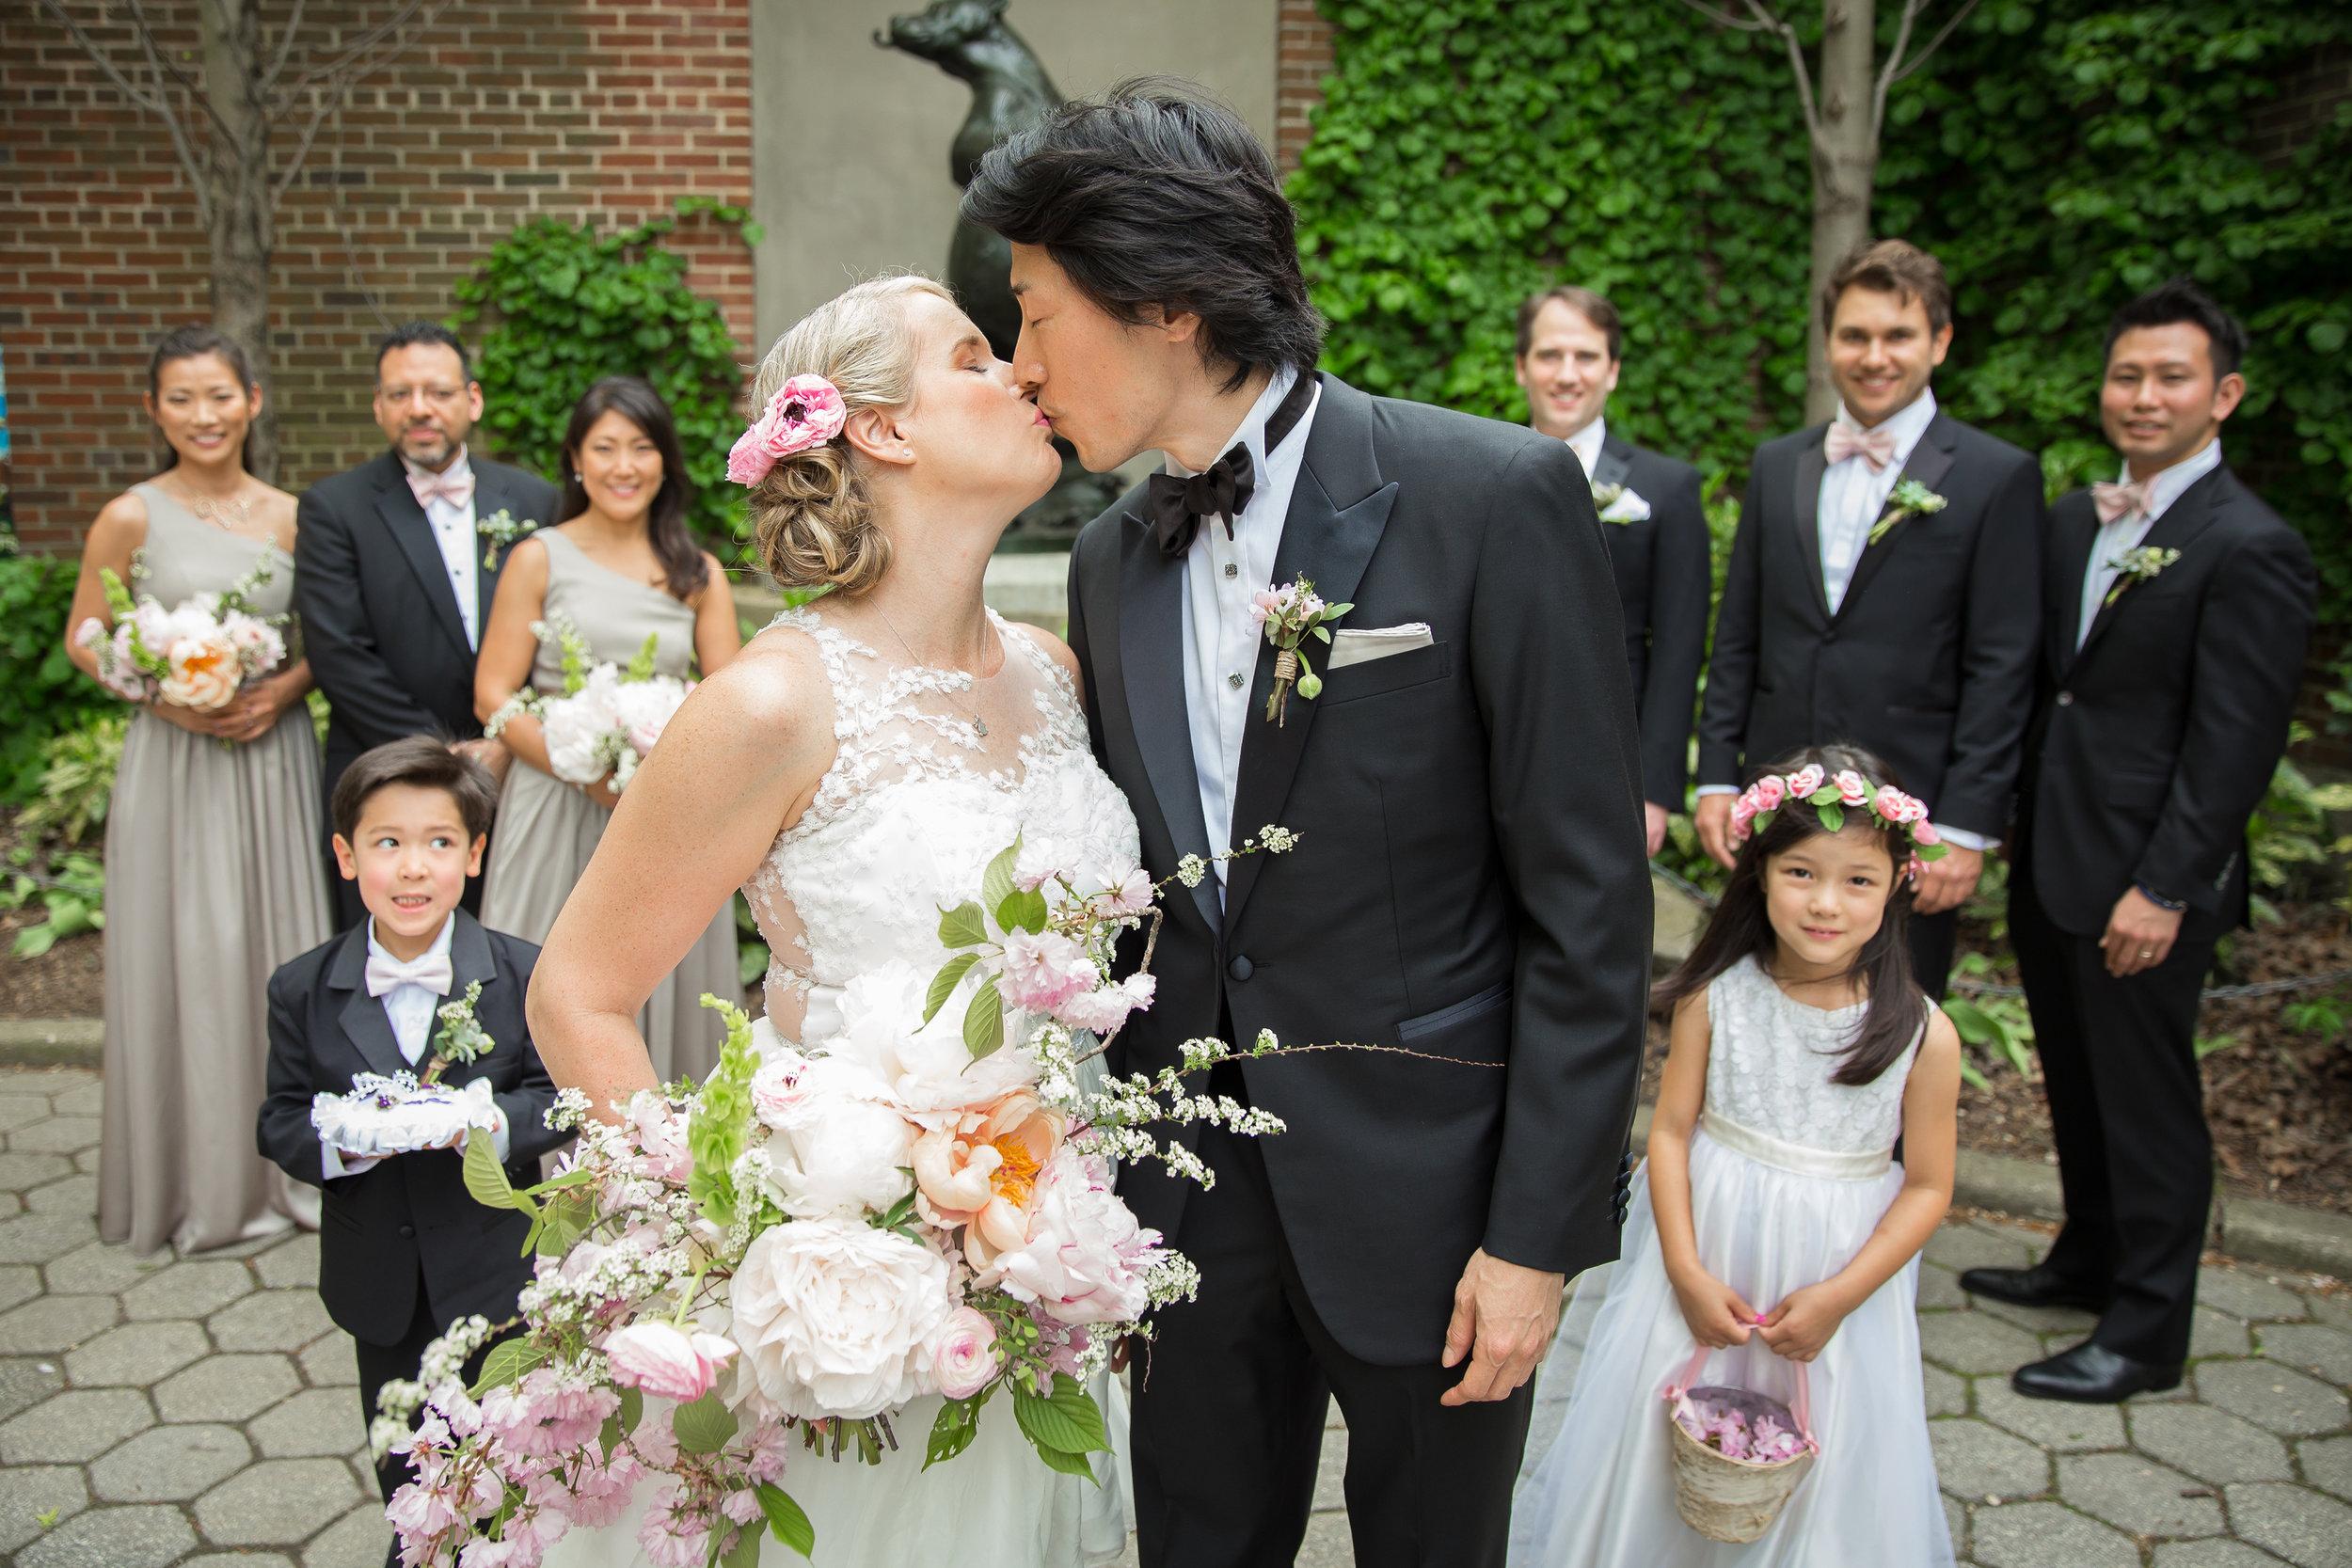 victorious-events-nyc-016-colleen-taka-central-park-zoo-wedding-raymond-hamlin.jpg